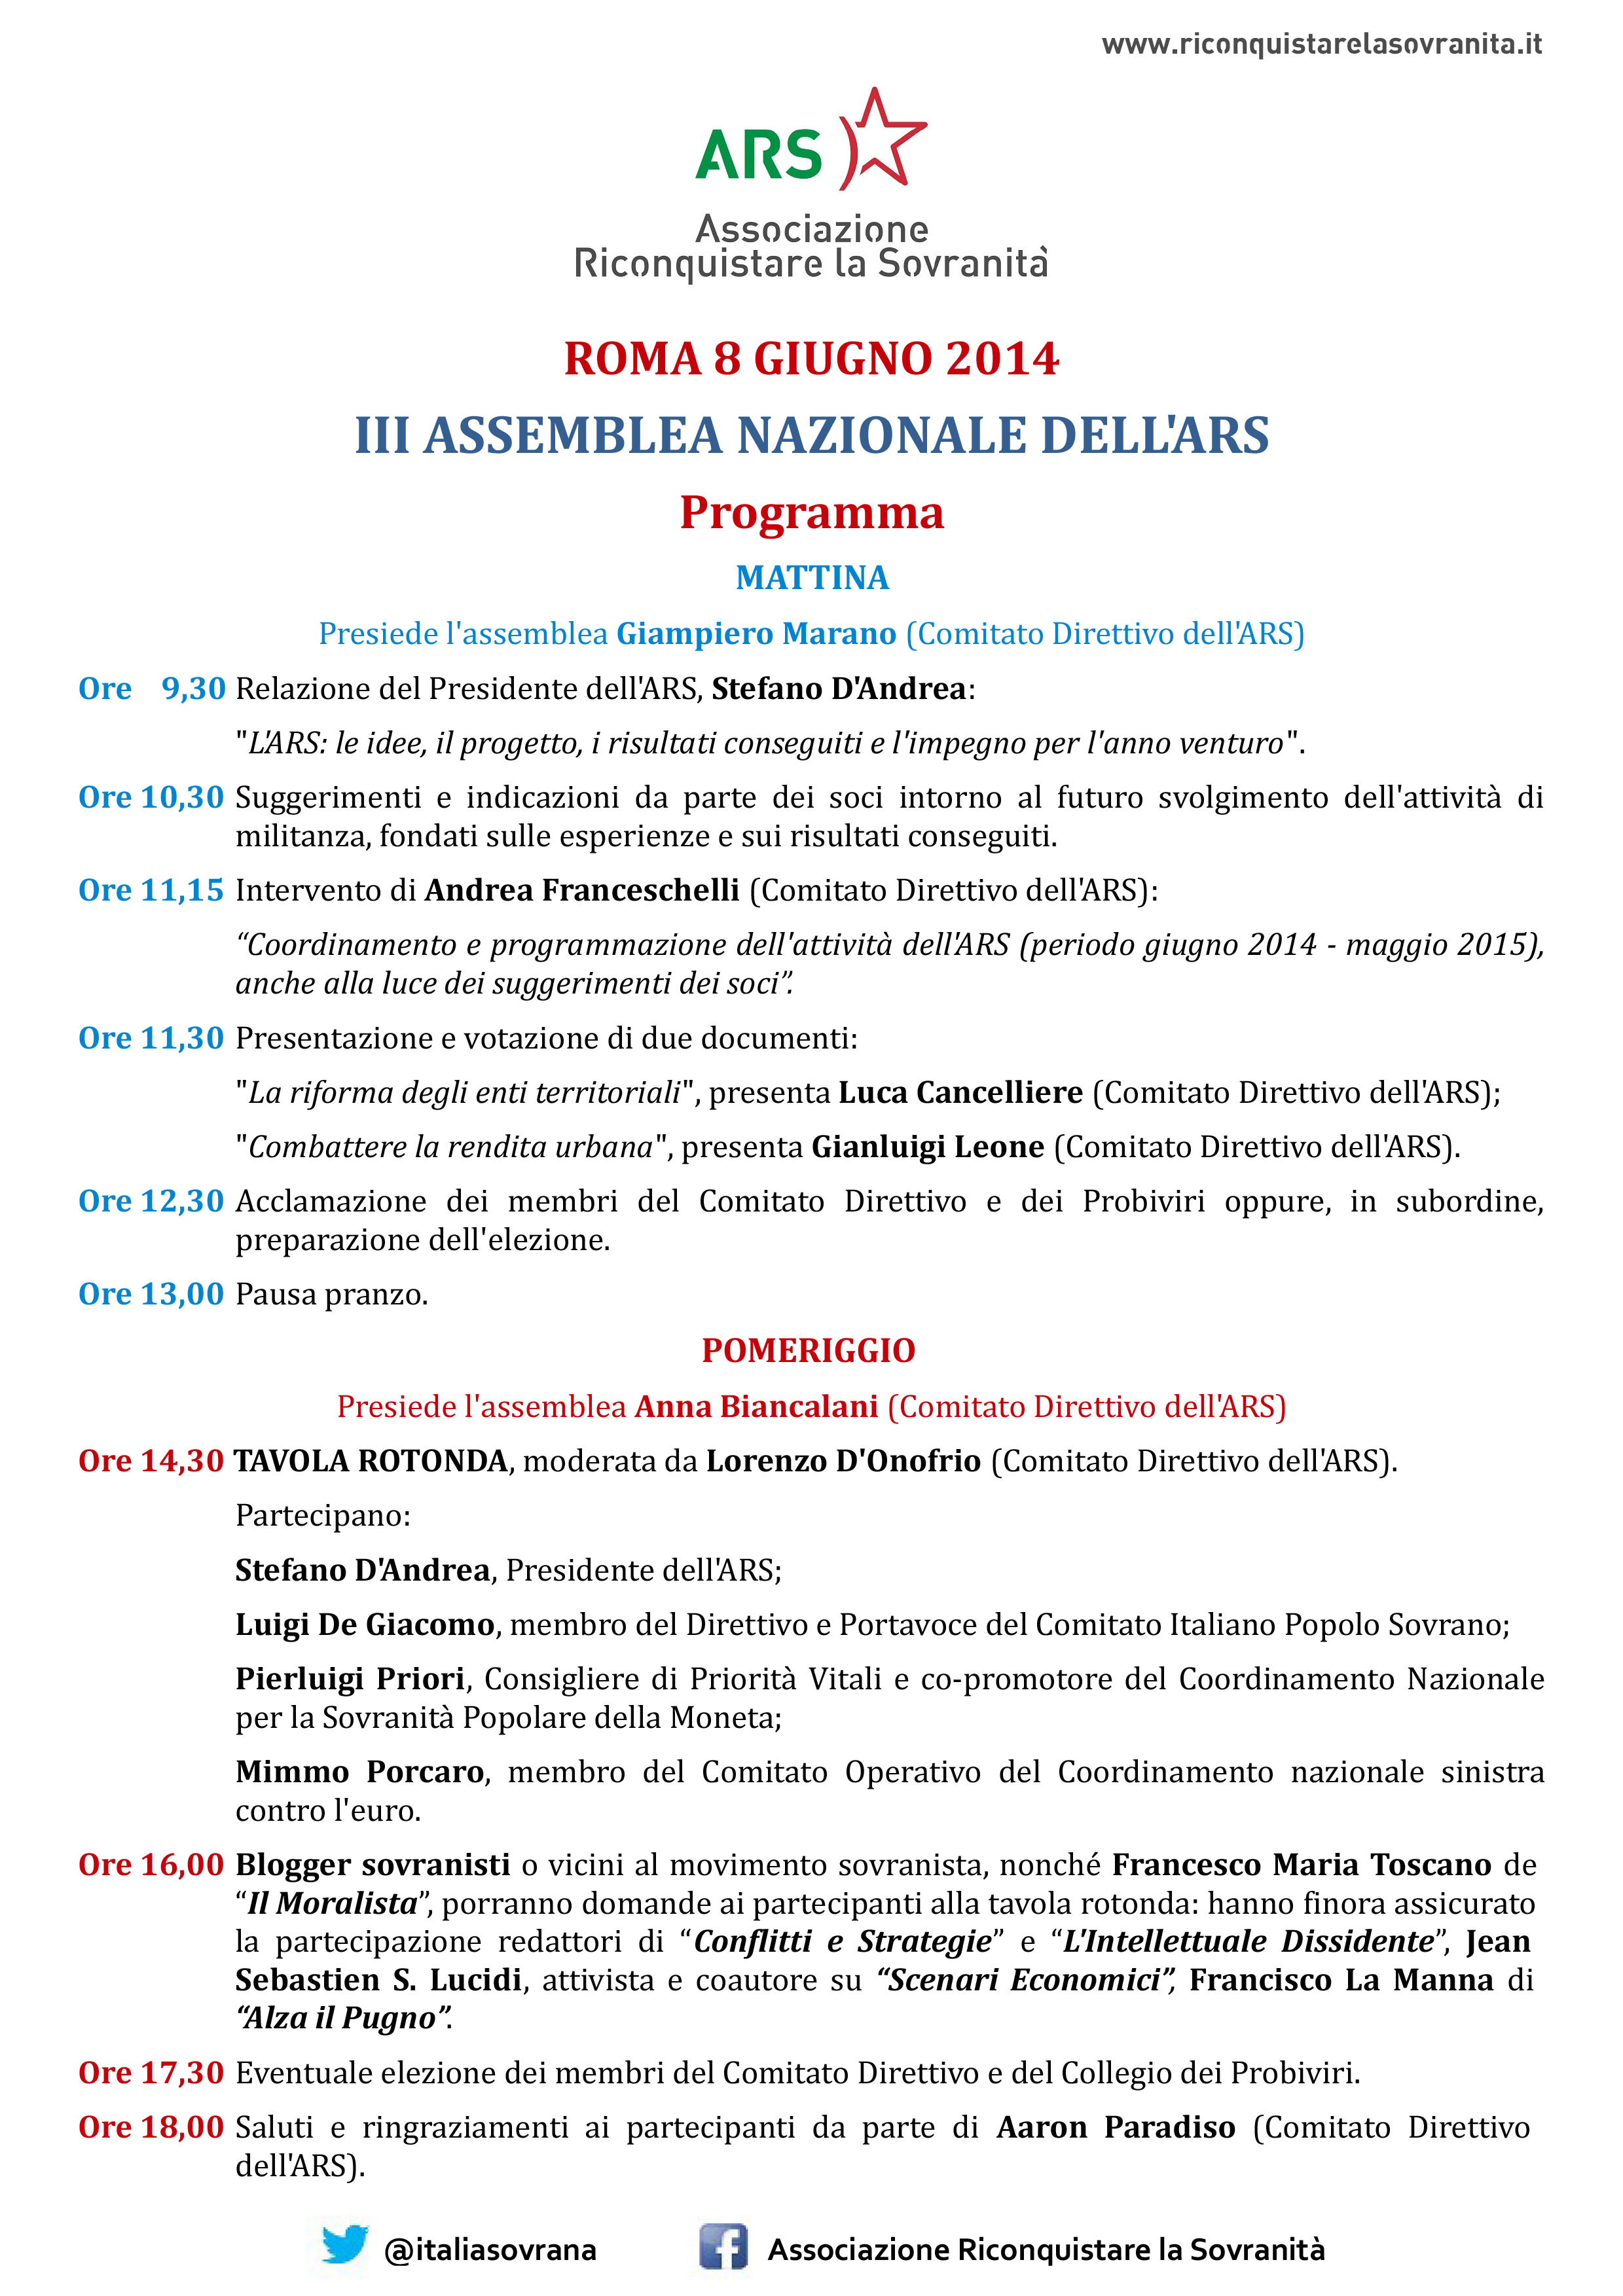 programma assemblea